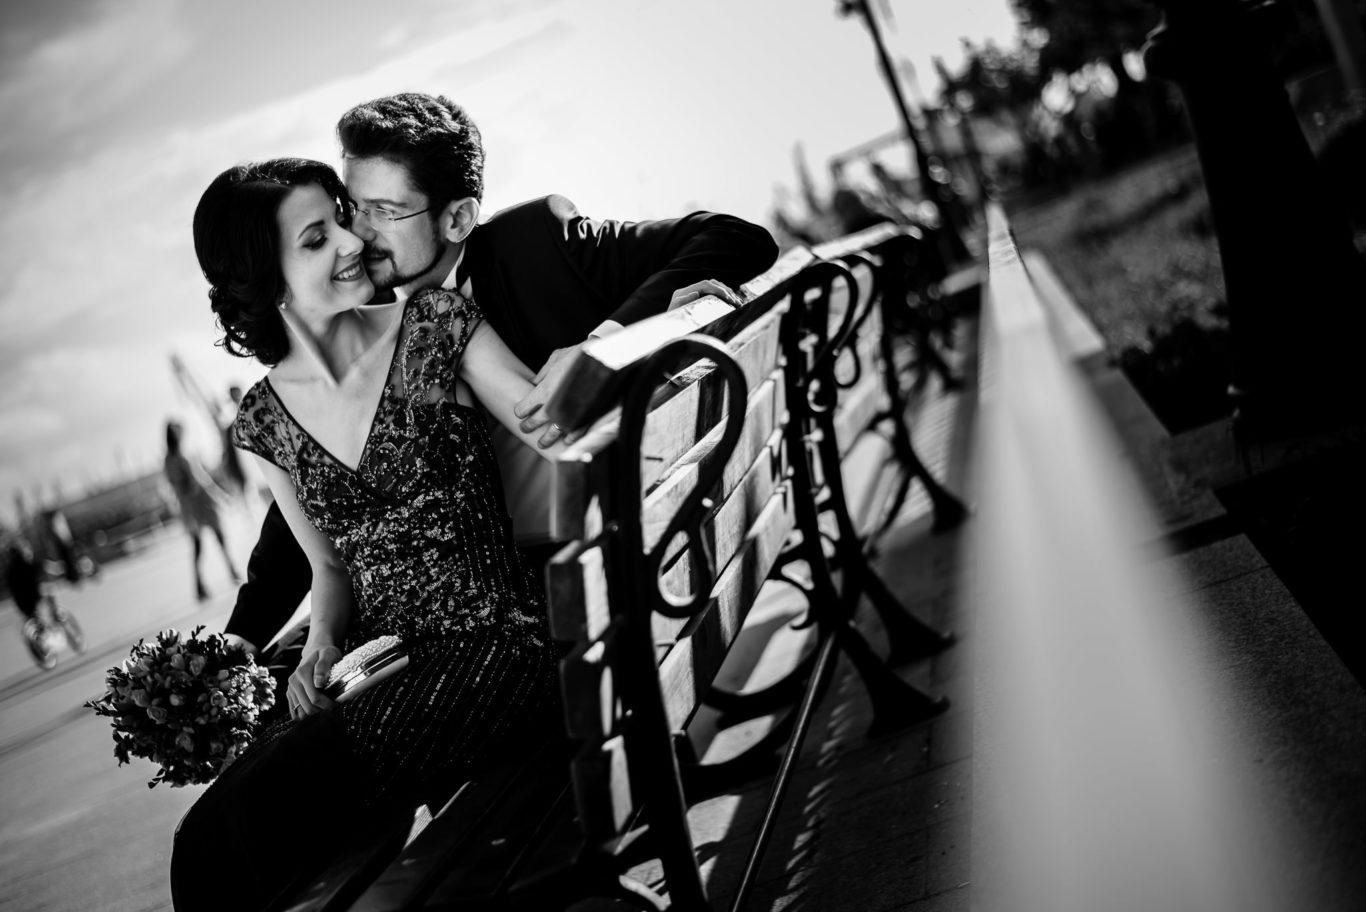 0617-Fotografie-nunta-Simona-Valentin-fotograf-Ciprian-Dumitrescu-DSC_2063